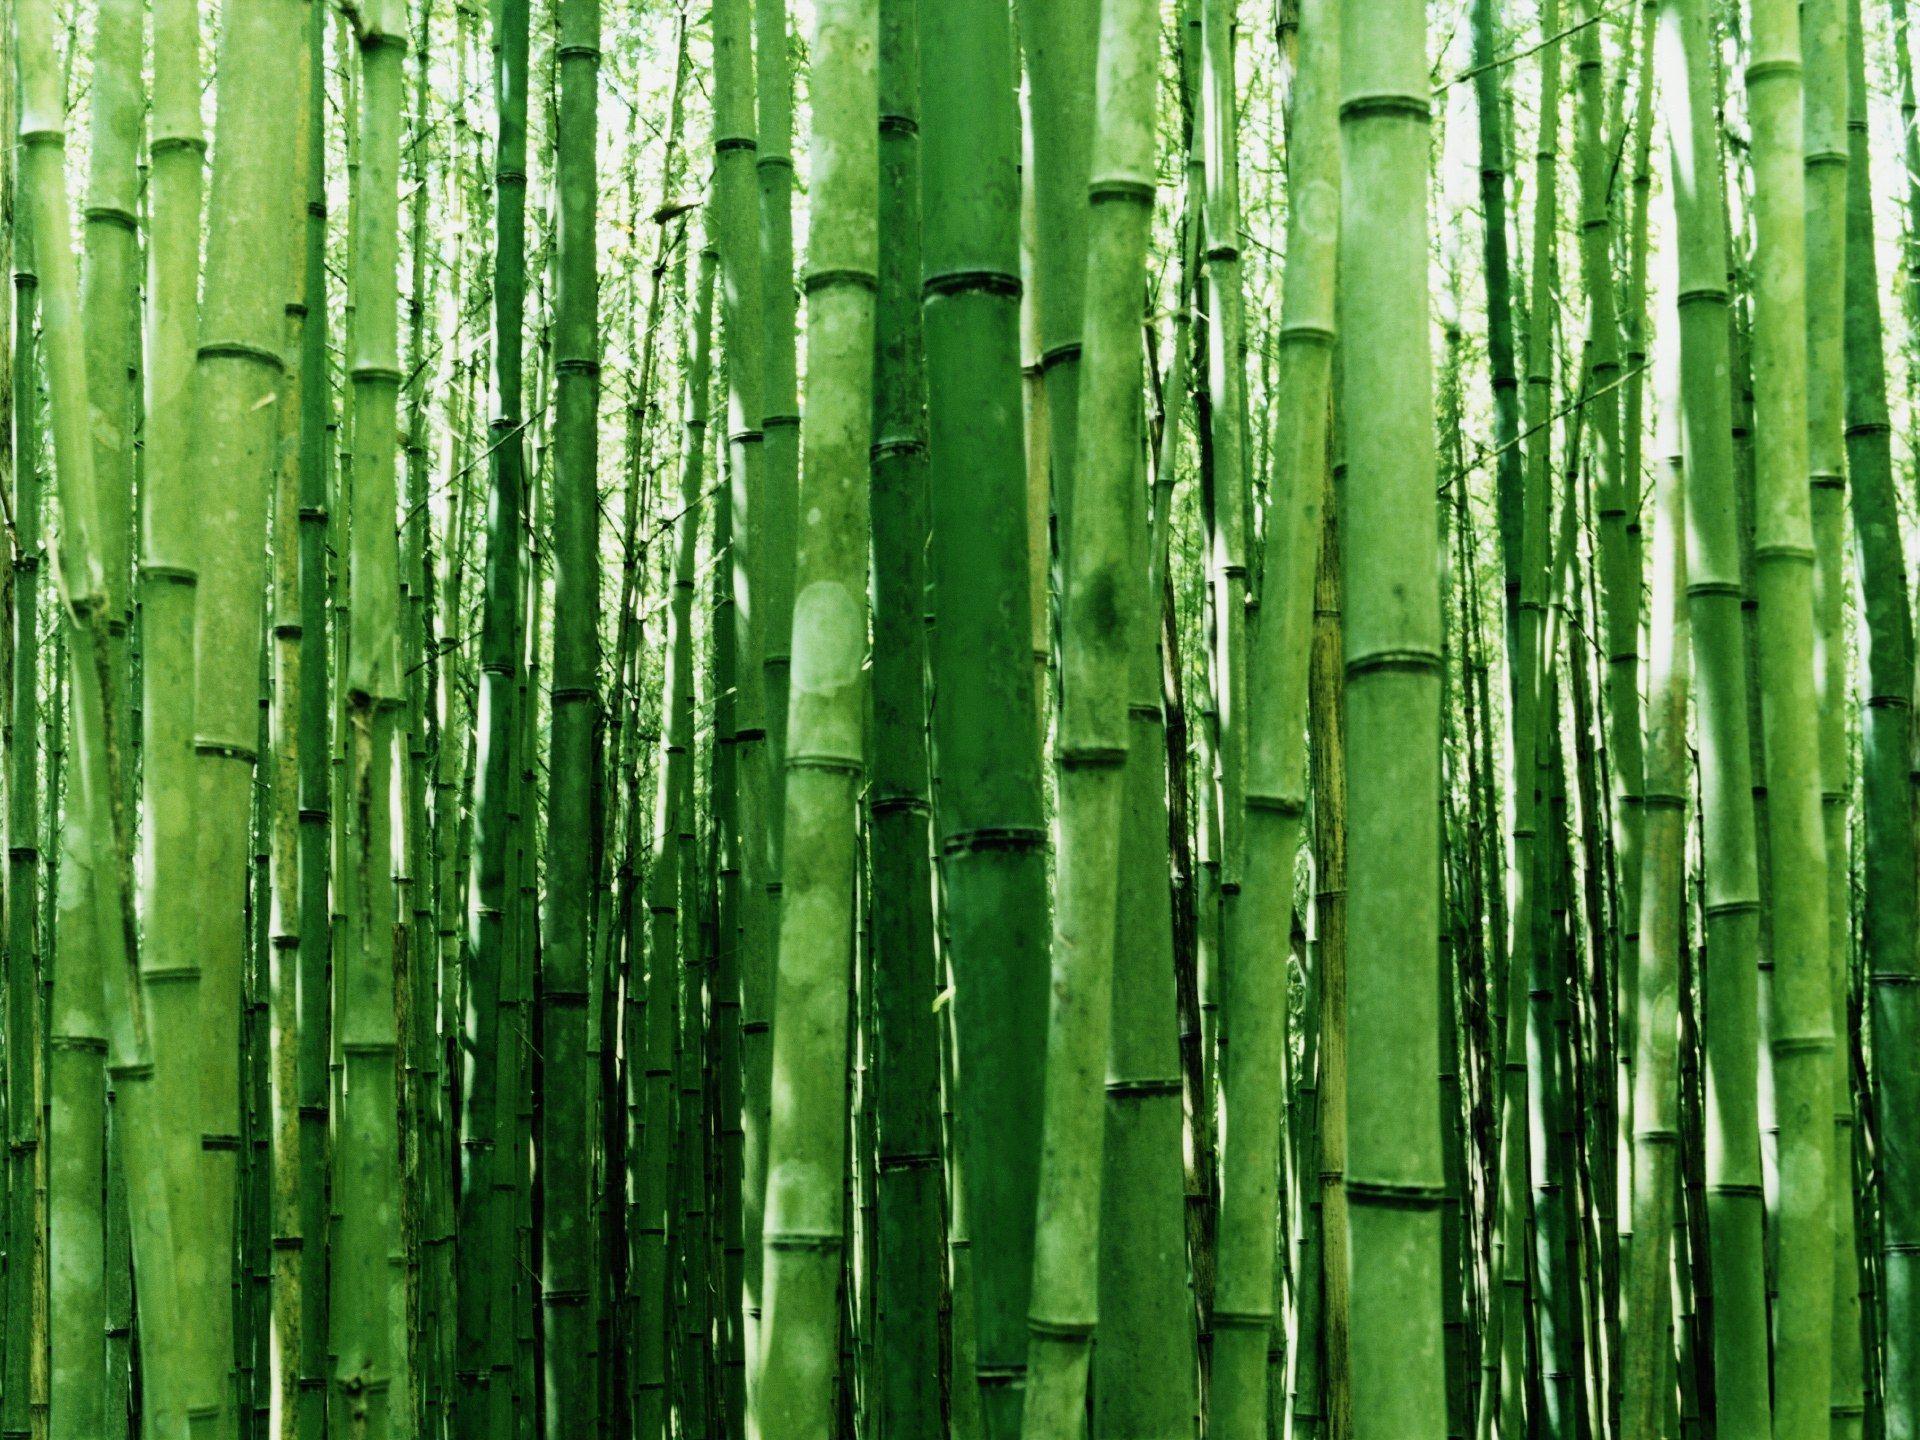 Beautiful Bamboo Bamboo Wallpaper Bamboo Plants Bamboo